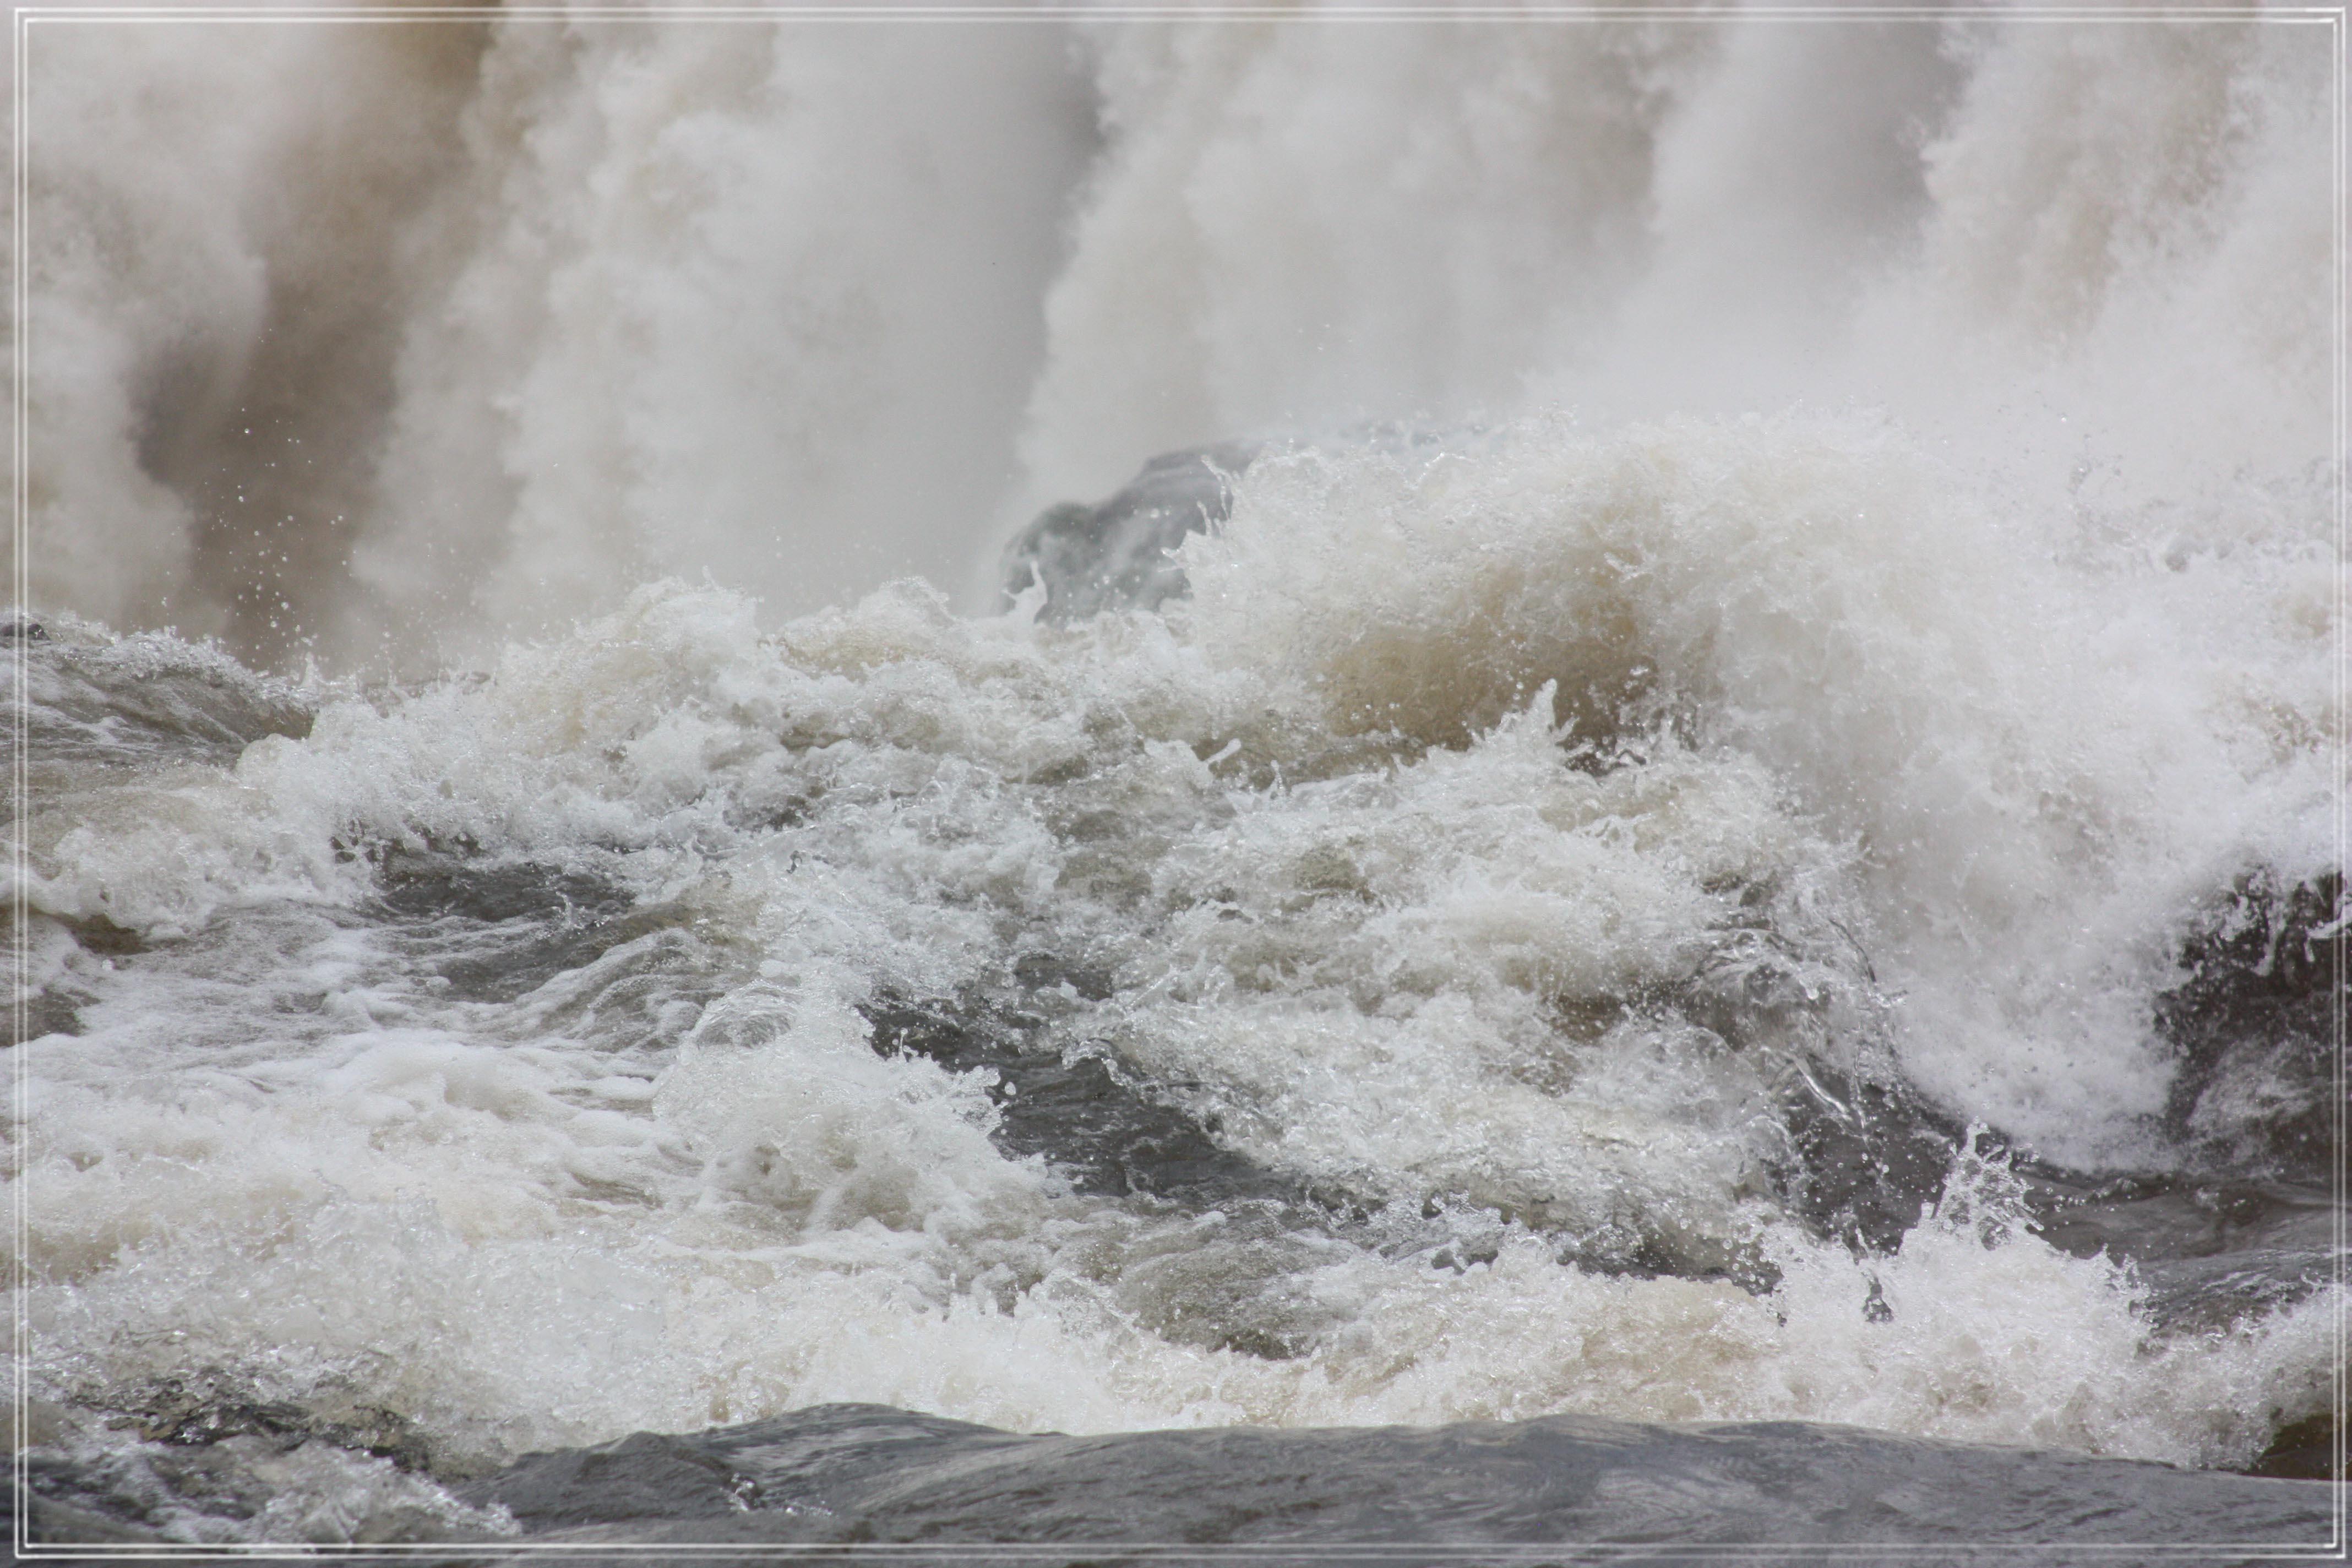 Iguazu Waterfall Closeup #1